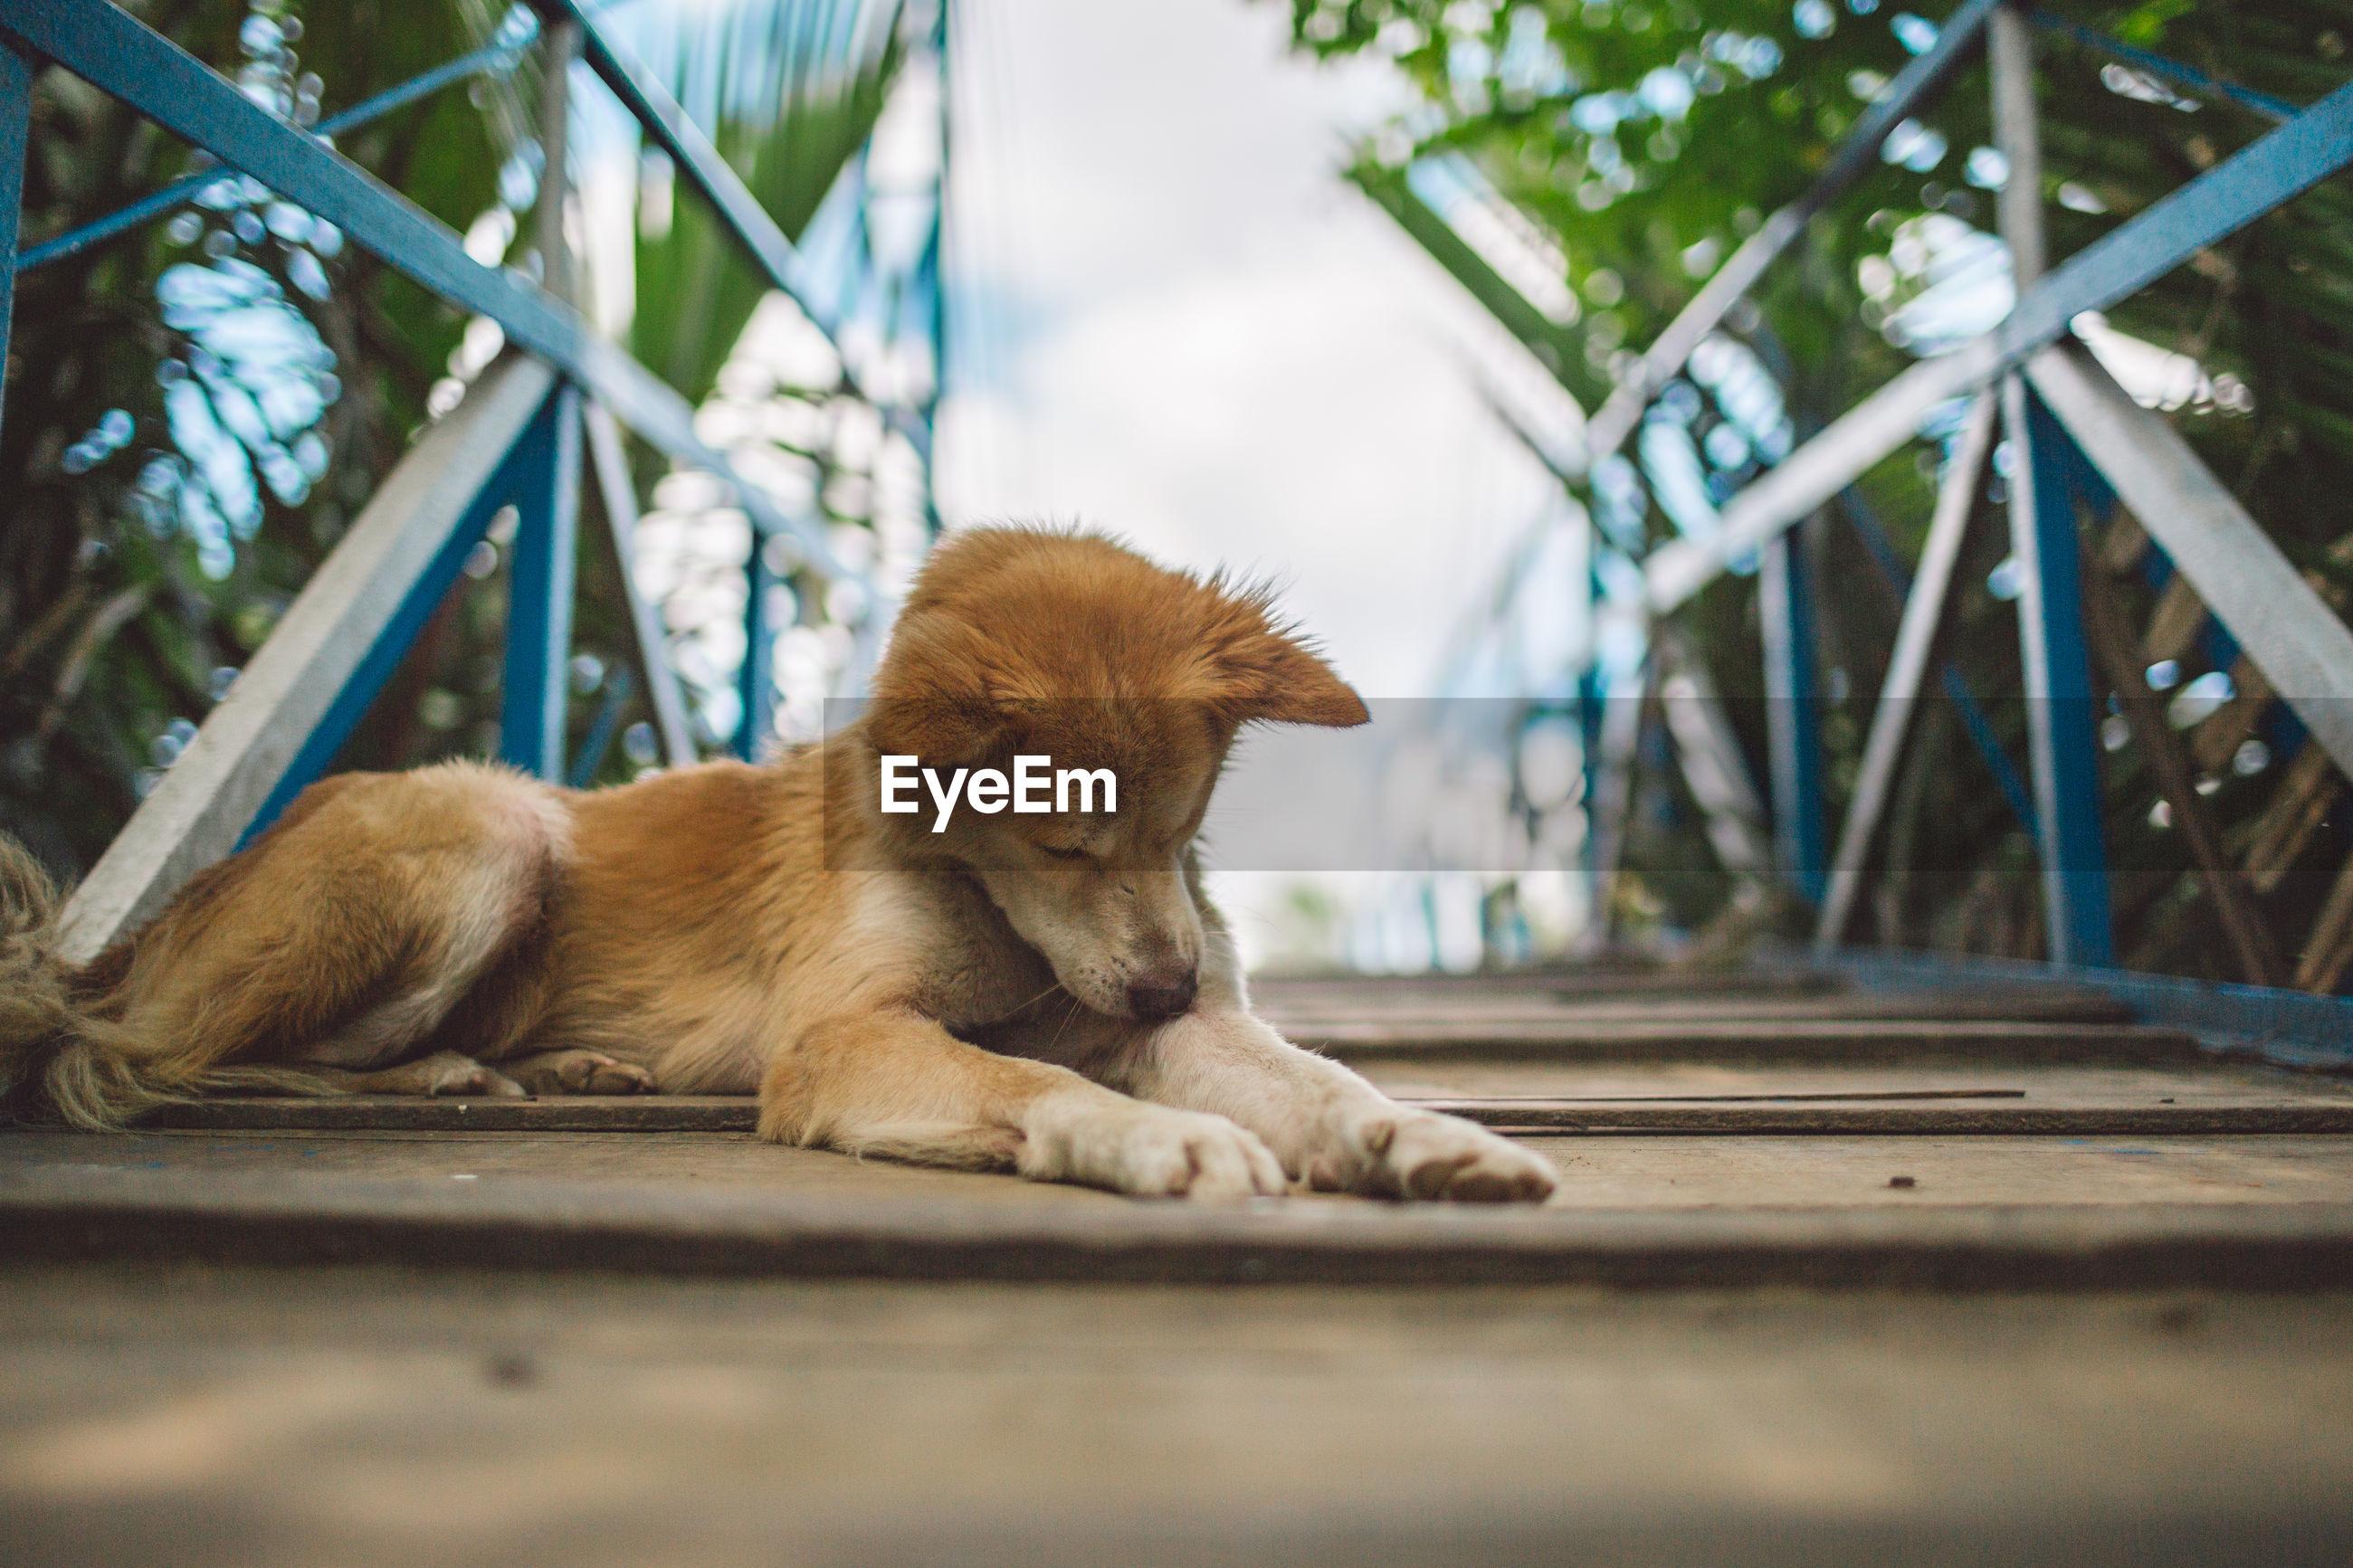 CLOSE-UP OF A DOG LYING